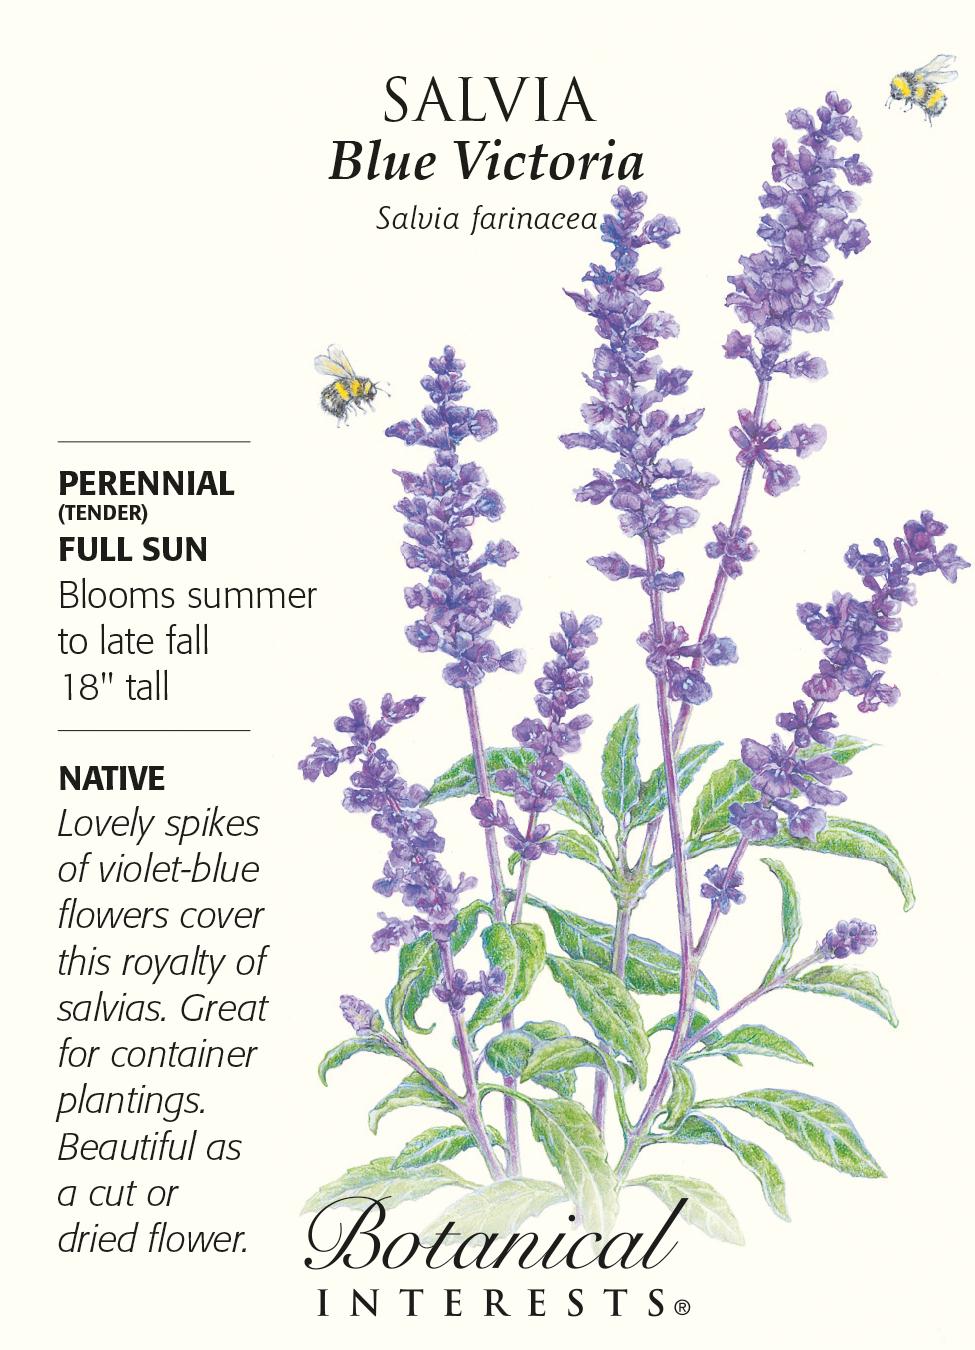 Blue victoria salvia seeds 100 mg perennial ebay blue victoria salvia seeds 100 mg perennial mightylinksfo